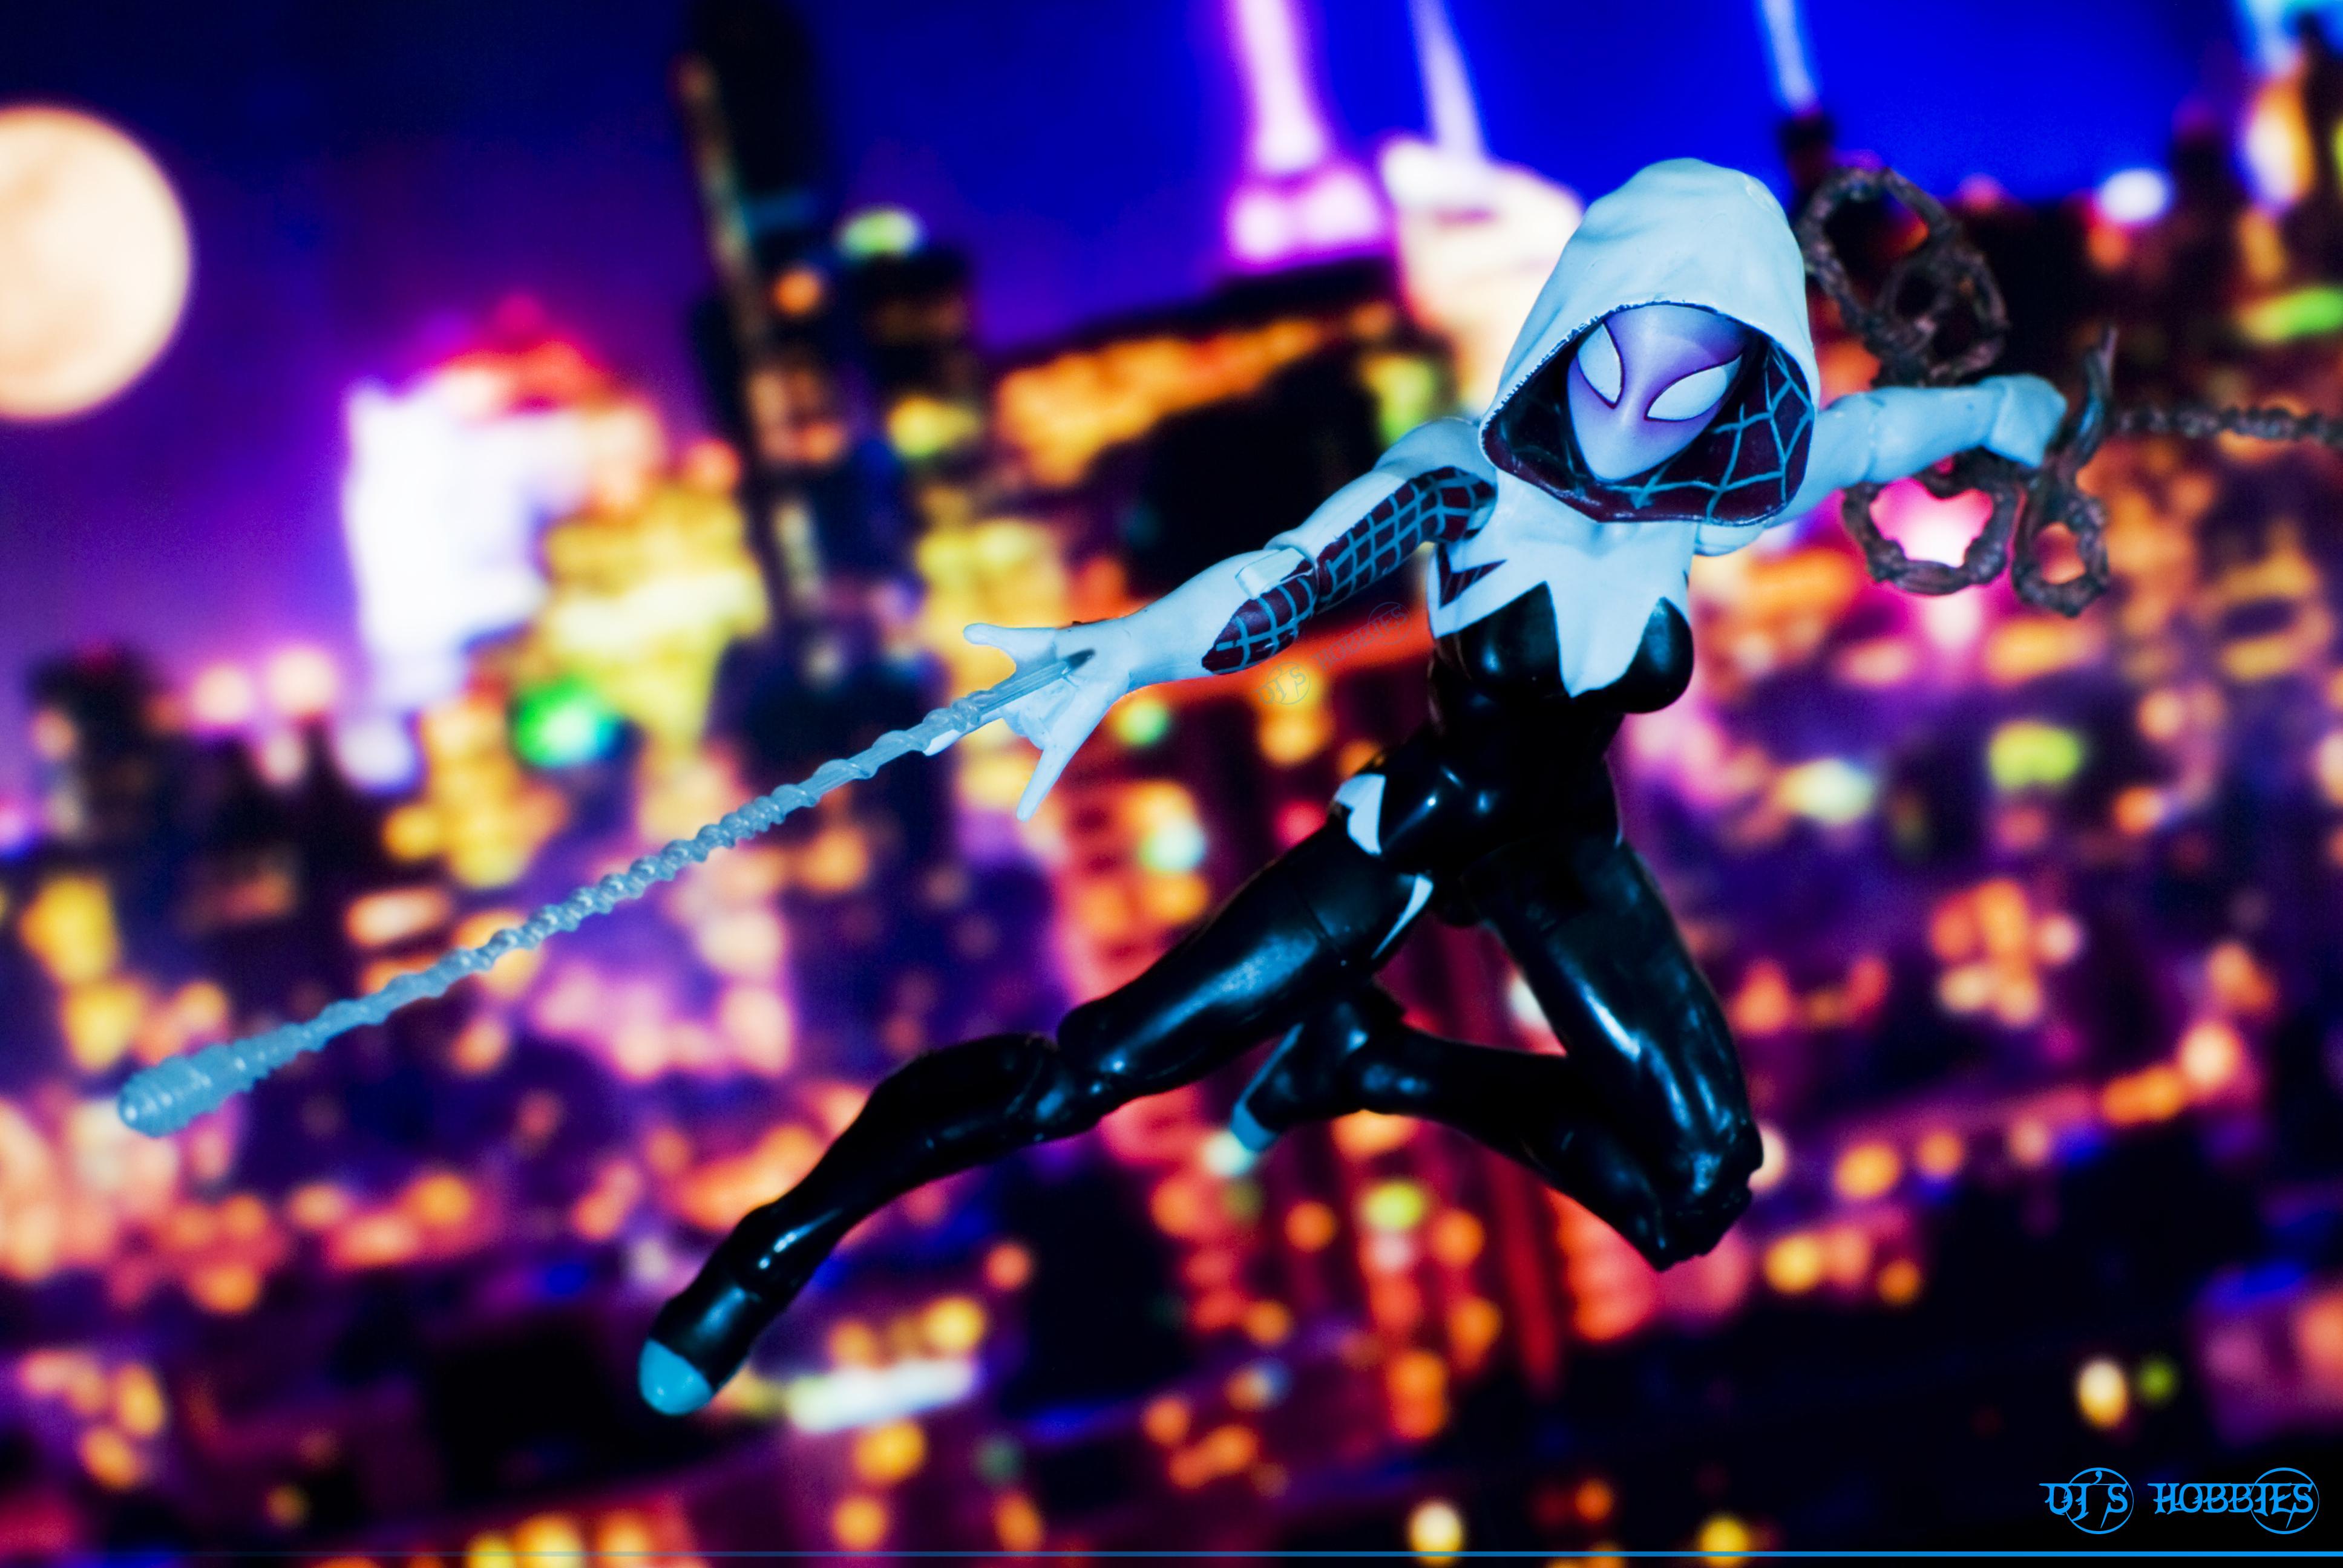 Actionfigure Spiderman Actionfigures Marvellegends Marvel Marvelcomics Hasbro Marveluniverse Spiderwoman Gwenstacy Acba Spidergwen Spidermanallies